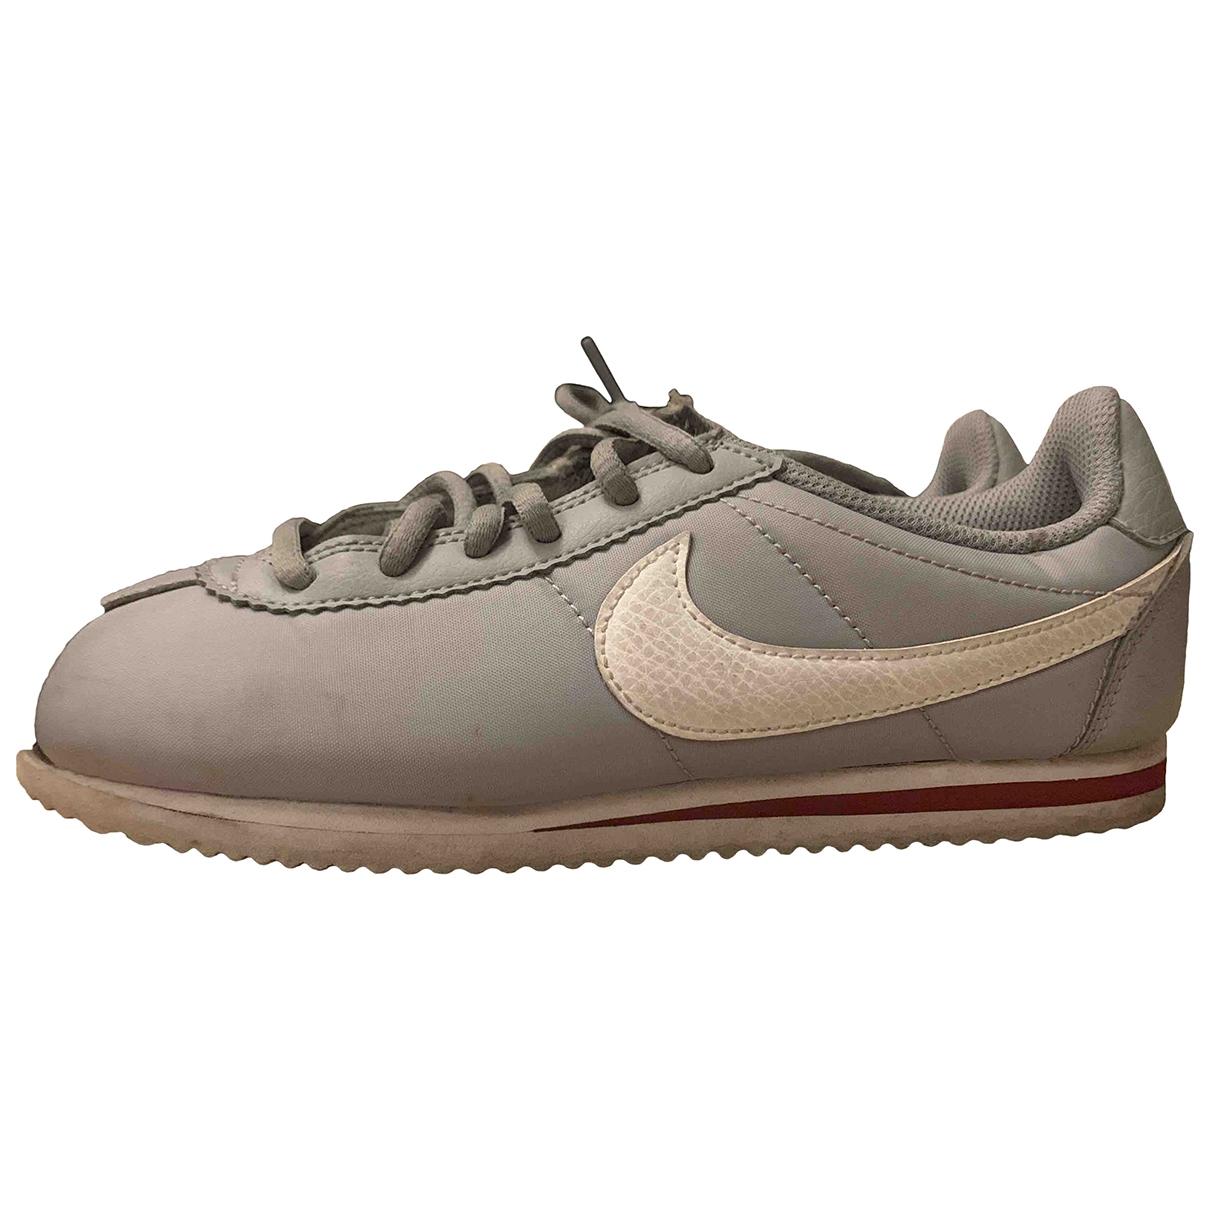 Deportivas Cortez de Lona Nike